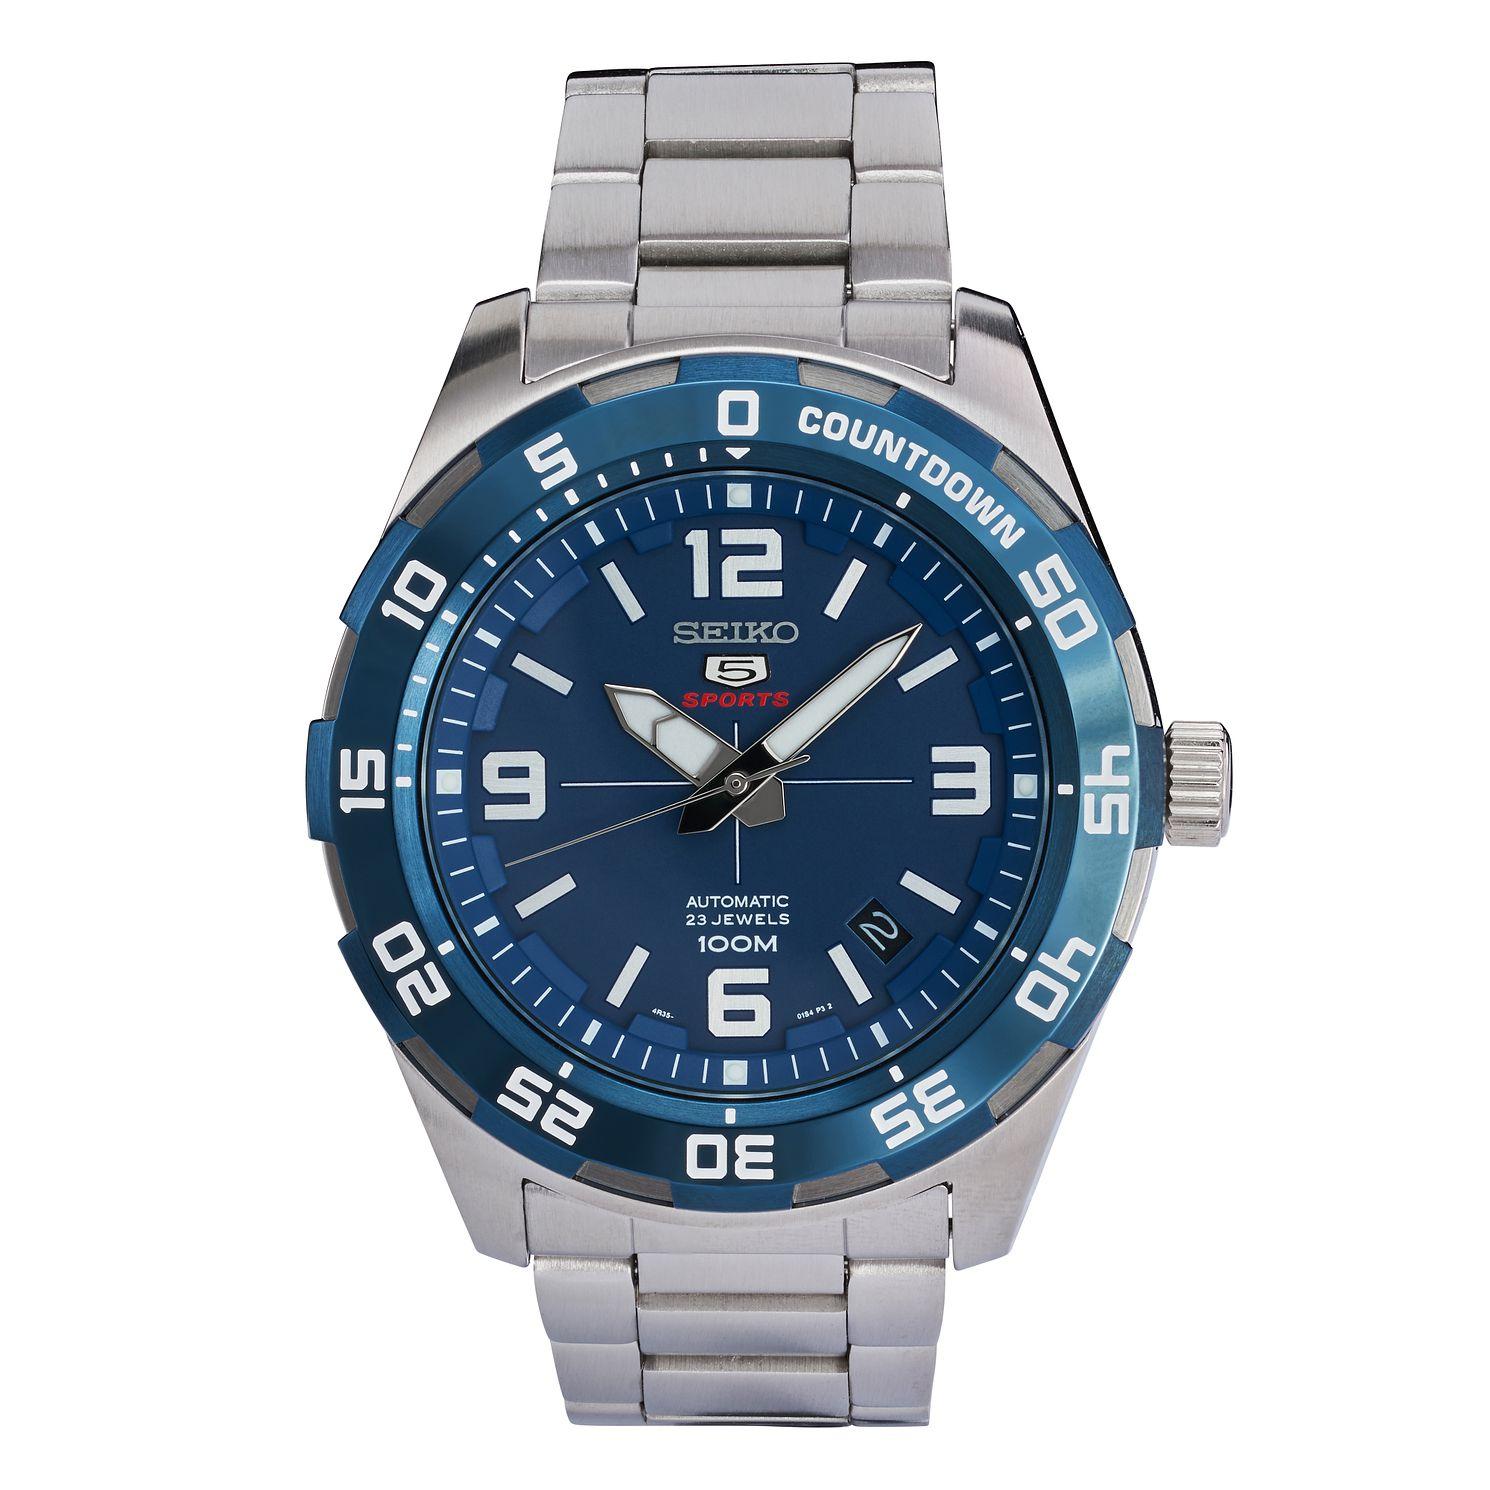 Seiko 5 Sports Automatic Men's Stainless Steel Bracelet Watch SRPB85K1, £105 at H.Samuel